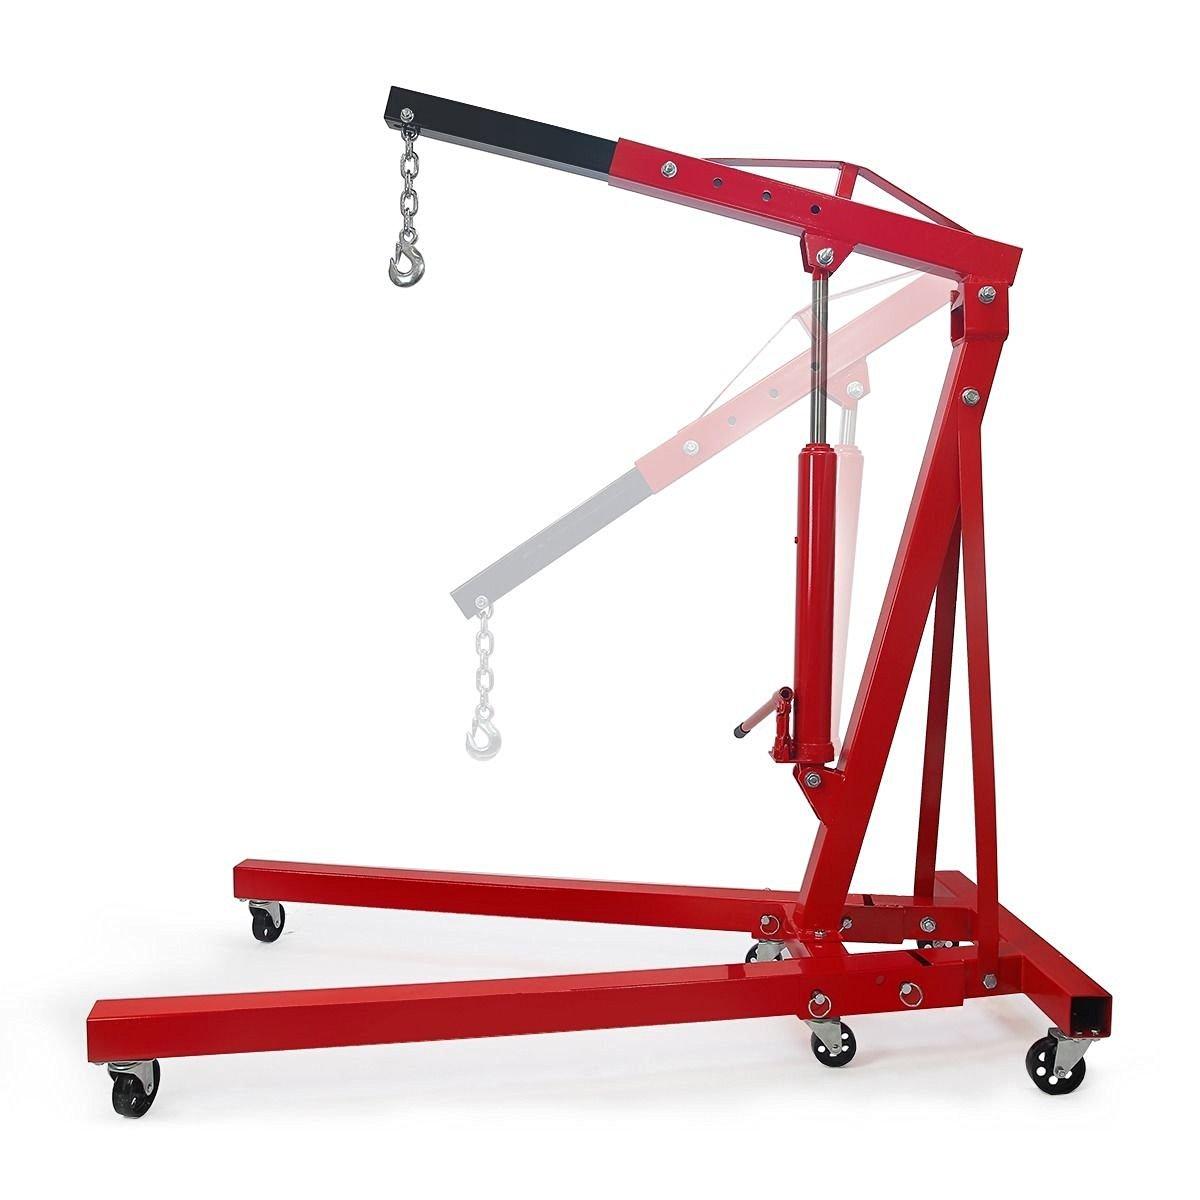 2 Ton Engine Motor Hoist Stands Cherry Picker Shop Crane Lift Foldable 4000 Lb